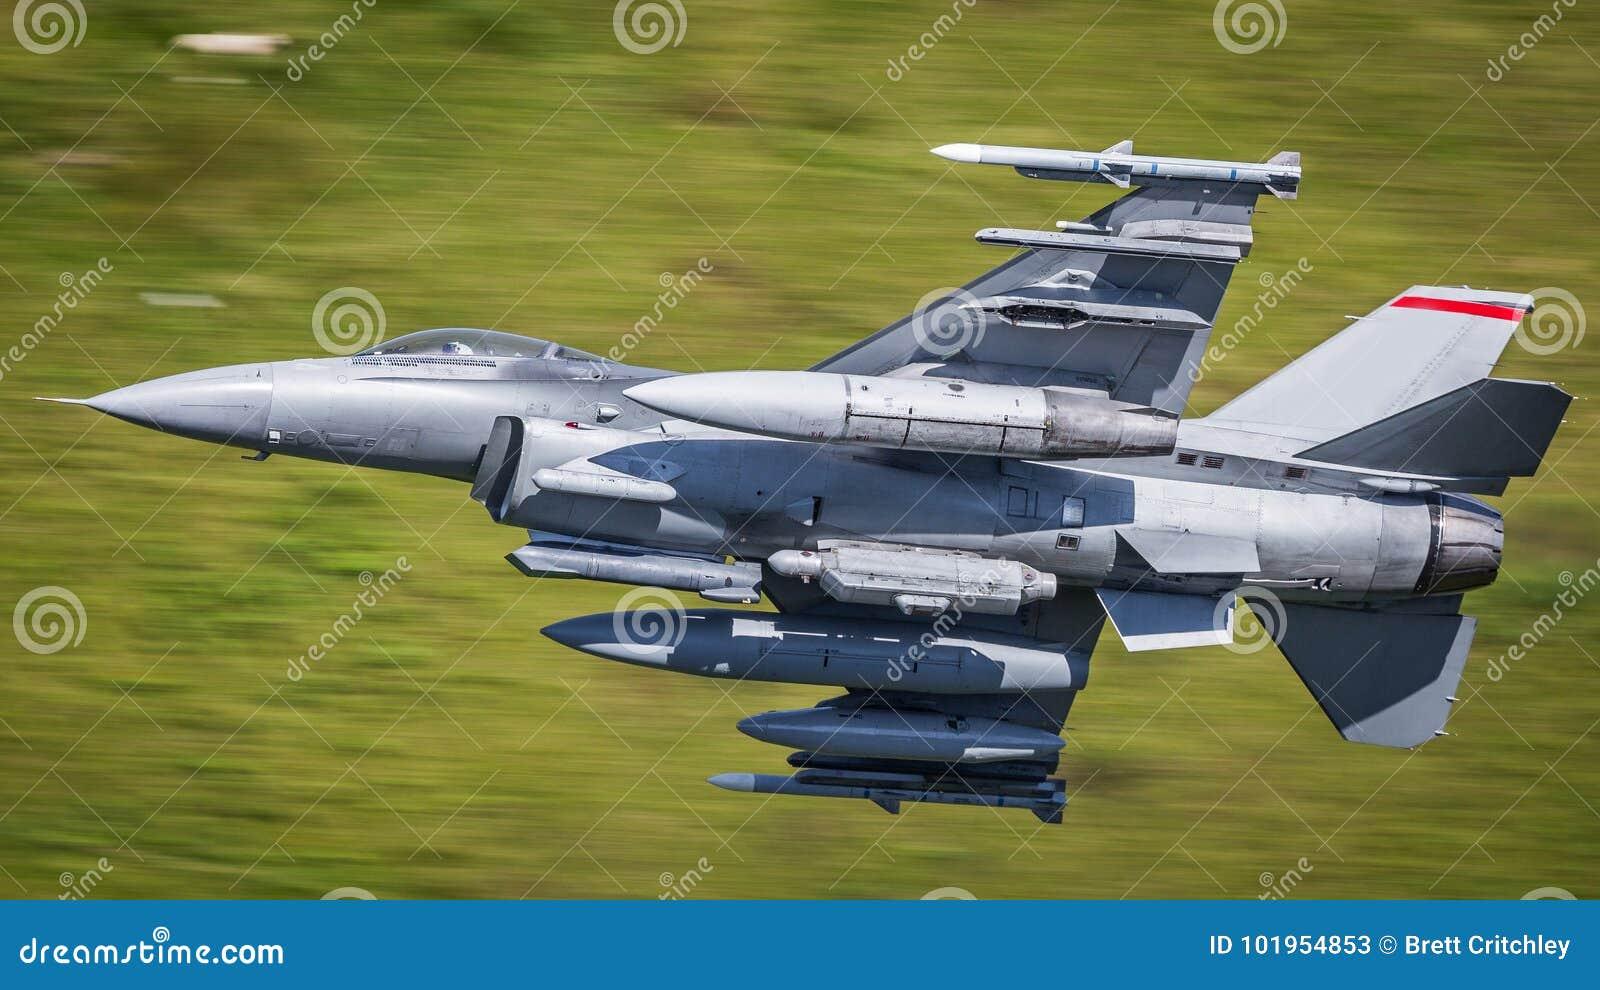 F16 fighter jet aircraft